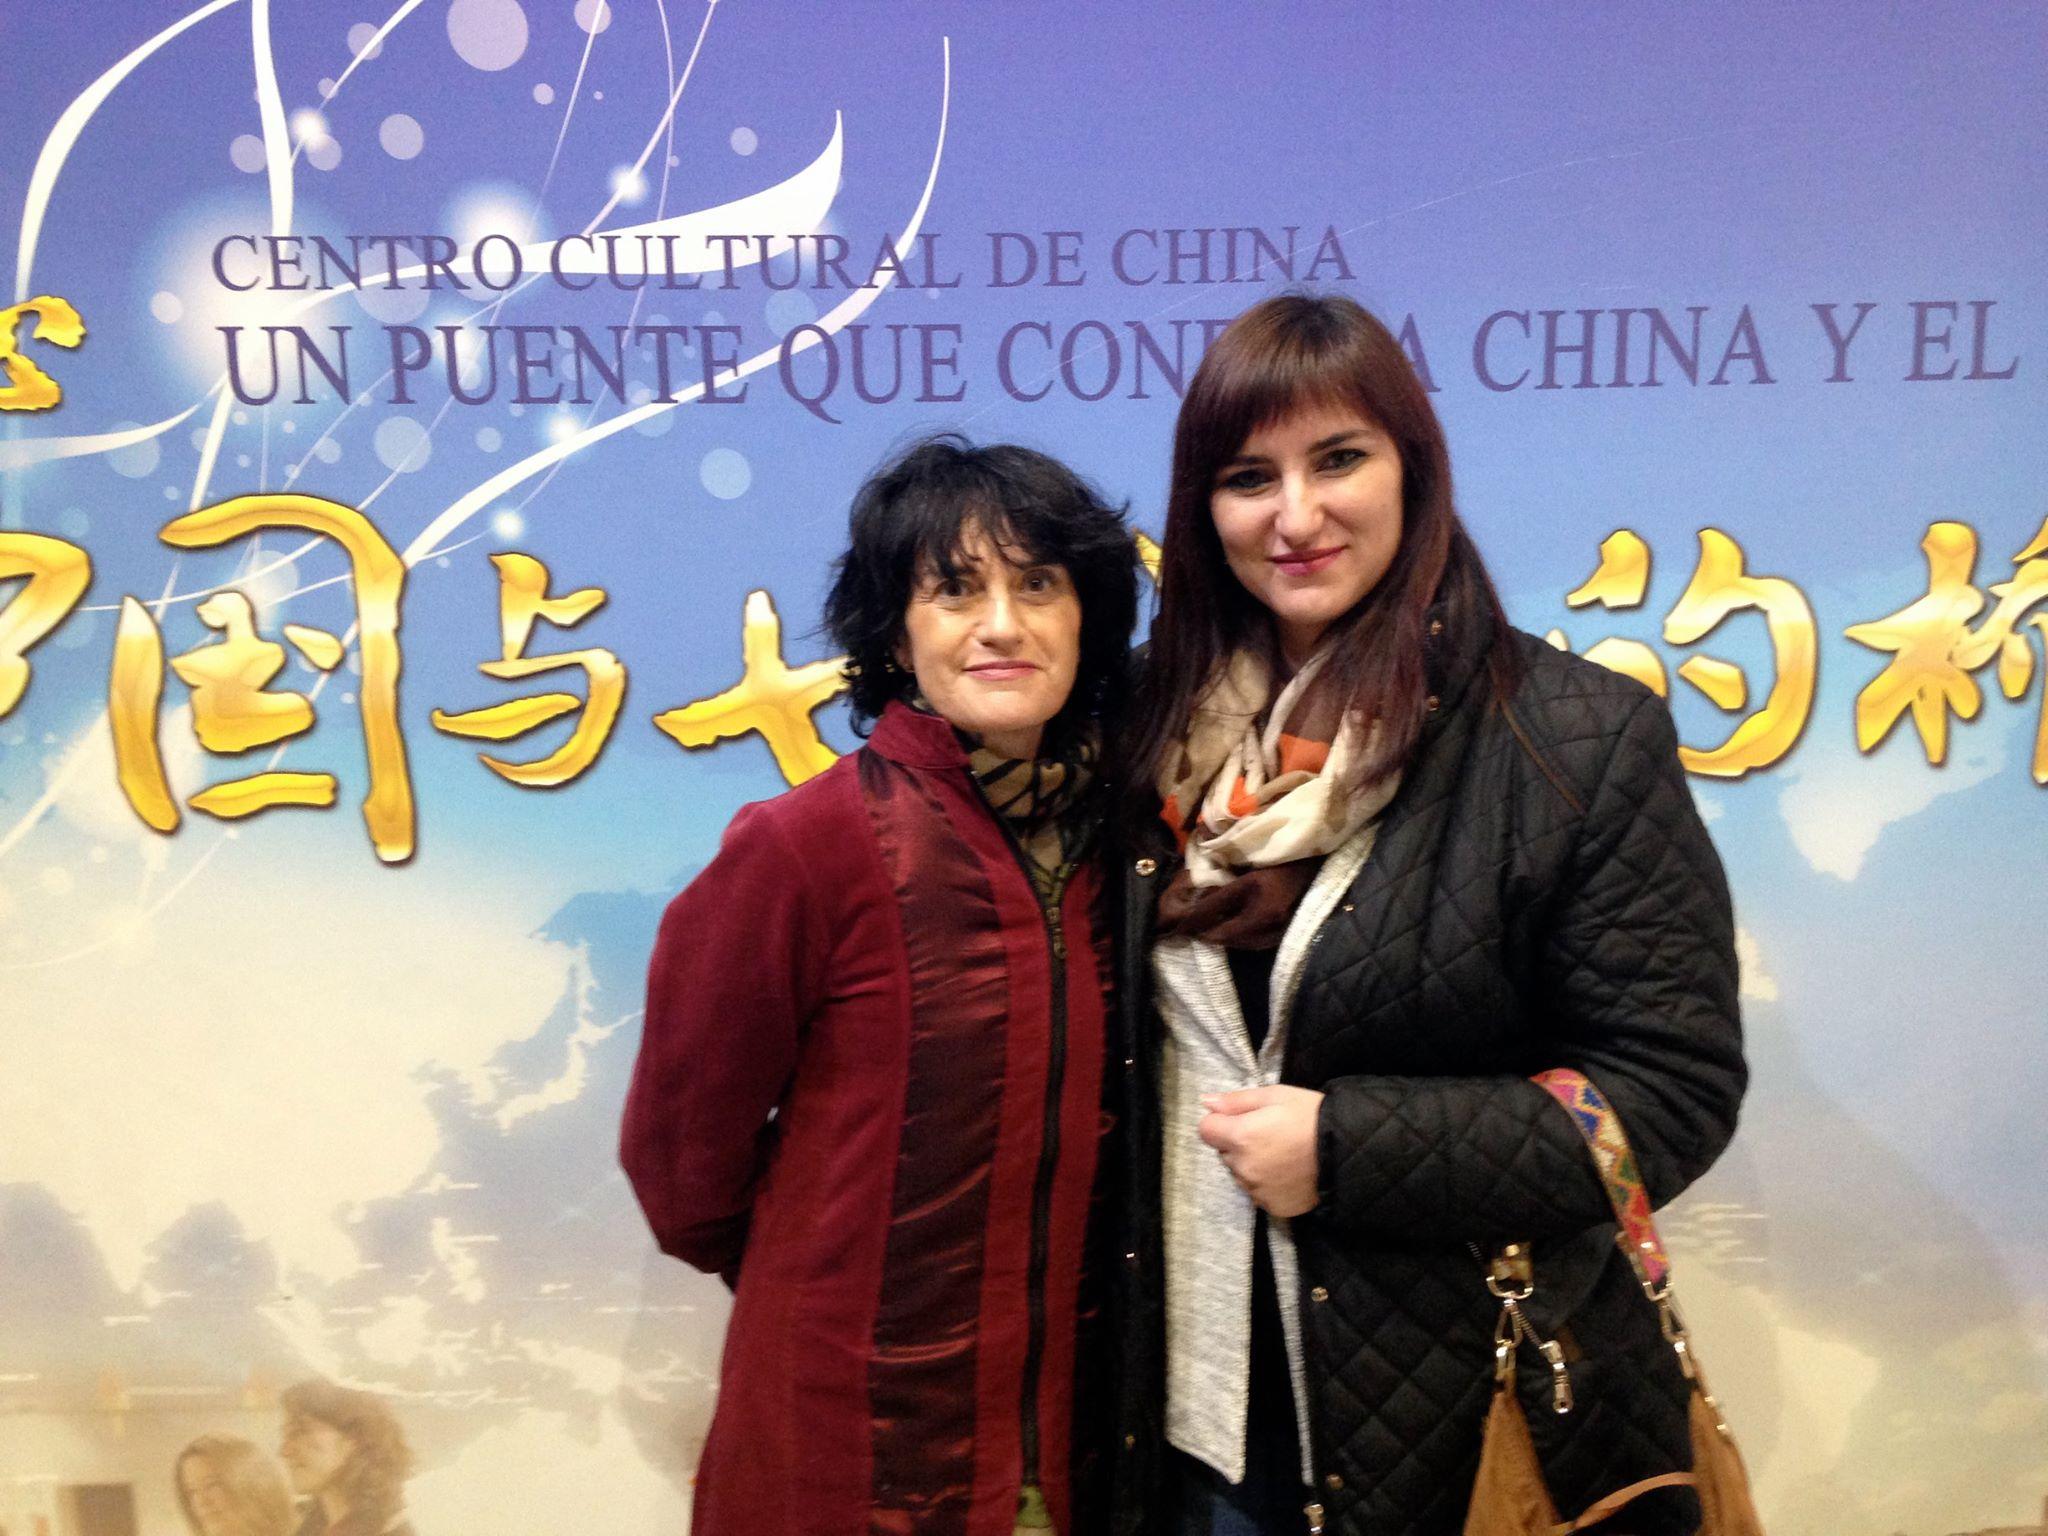 Olga neto Nuria Lorite libros China